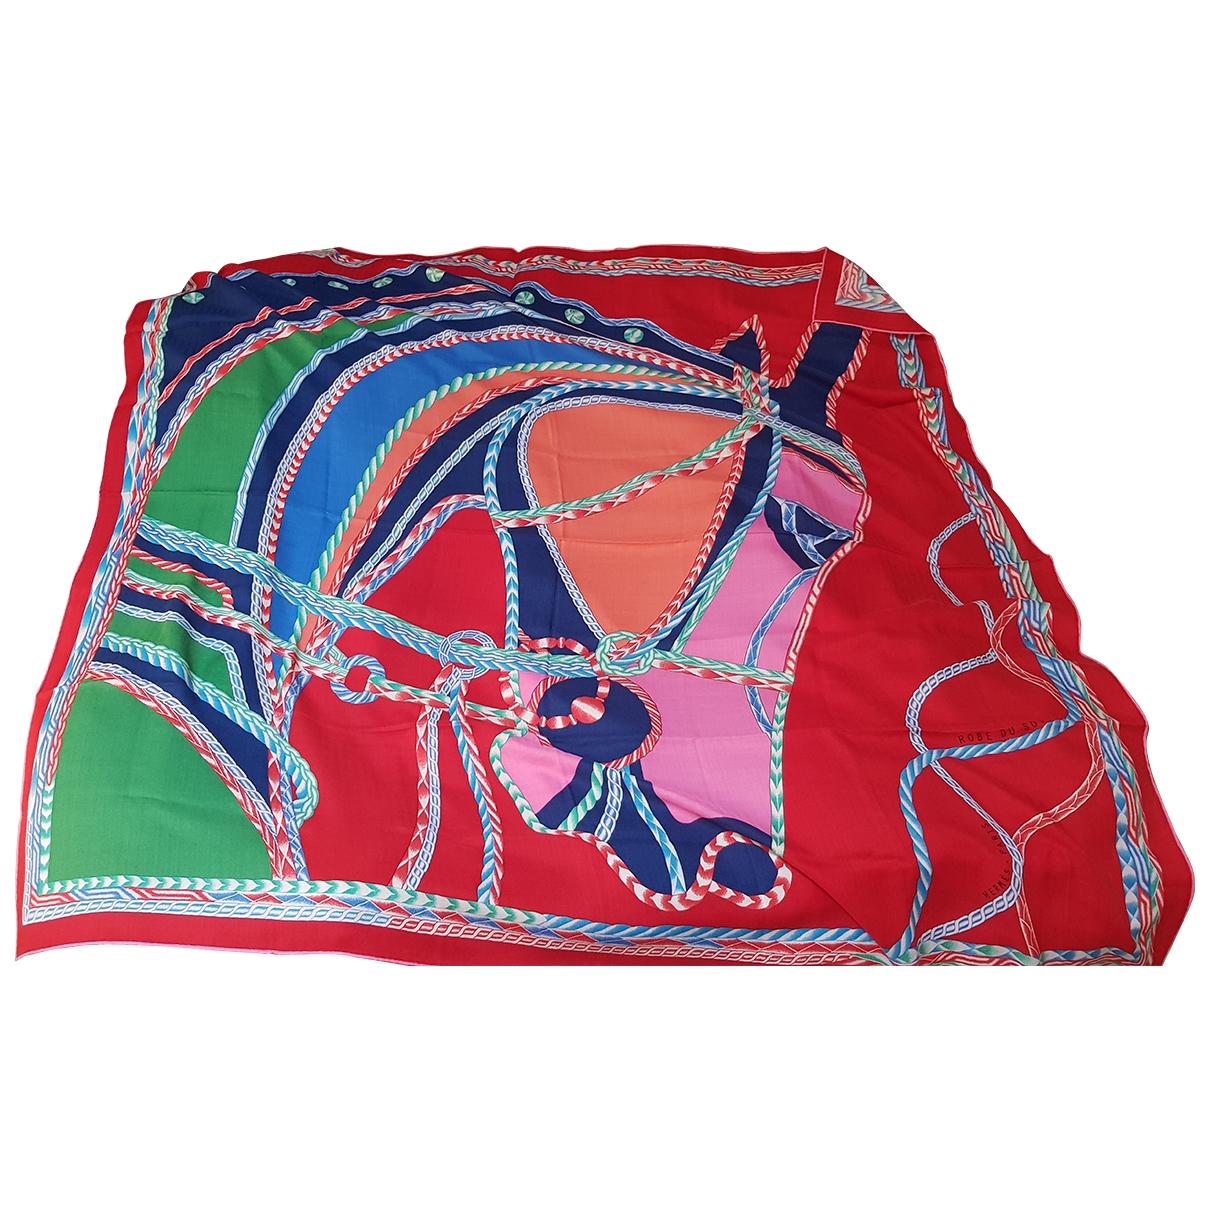 Pañuelo Chale de Cachemira Hermes